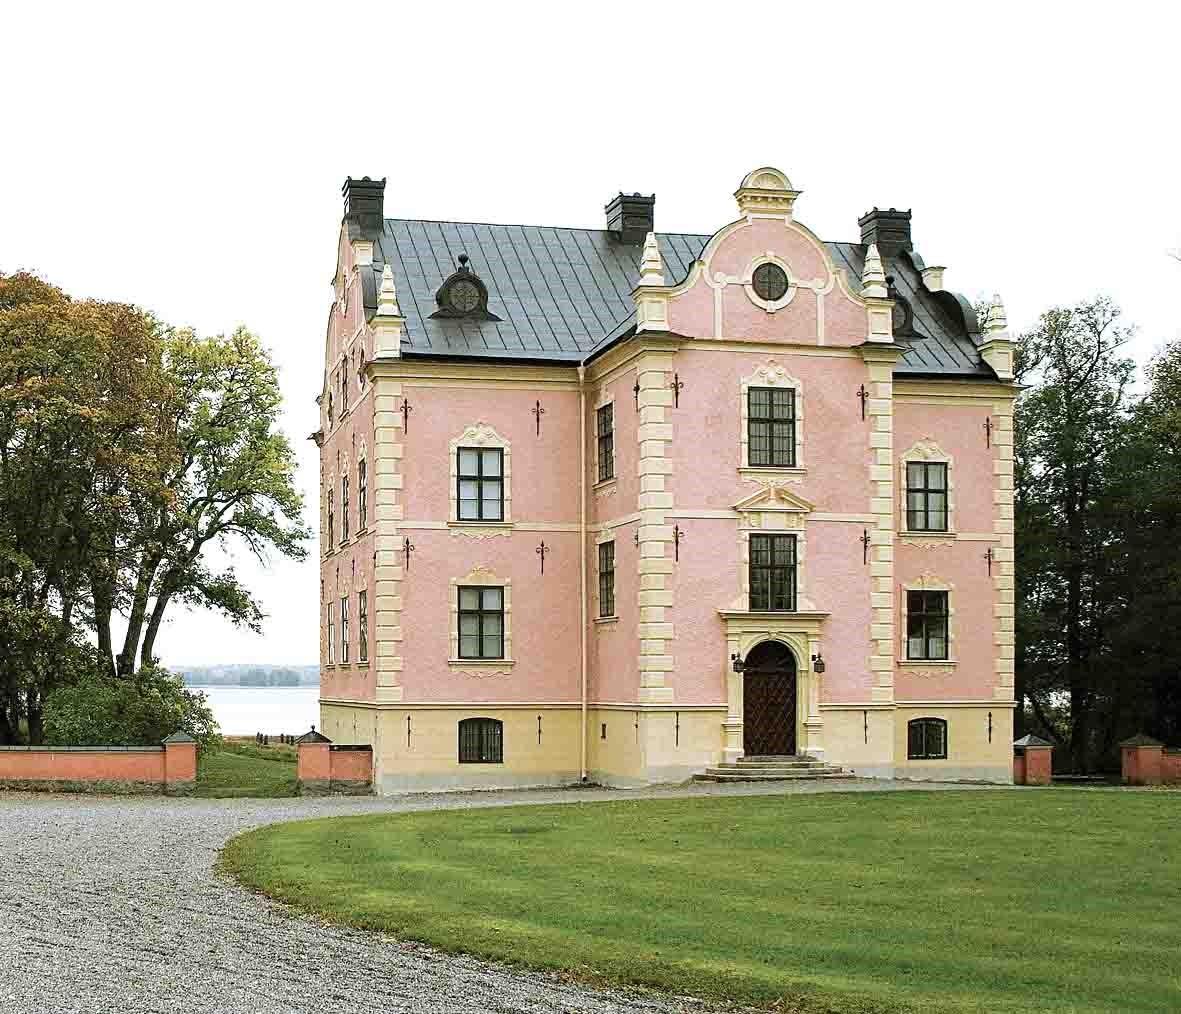 skånelaholms slott karta Skånelaholms Slott   Svenskt Kulturarv skånelaholms slott karta